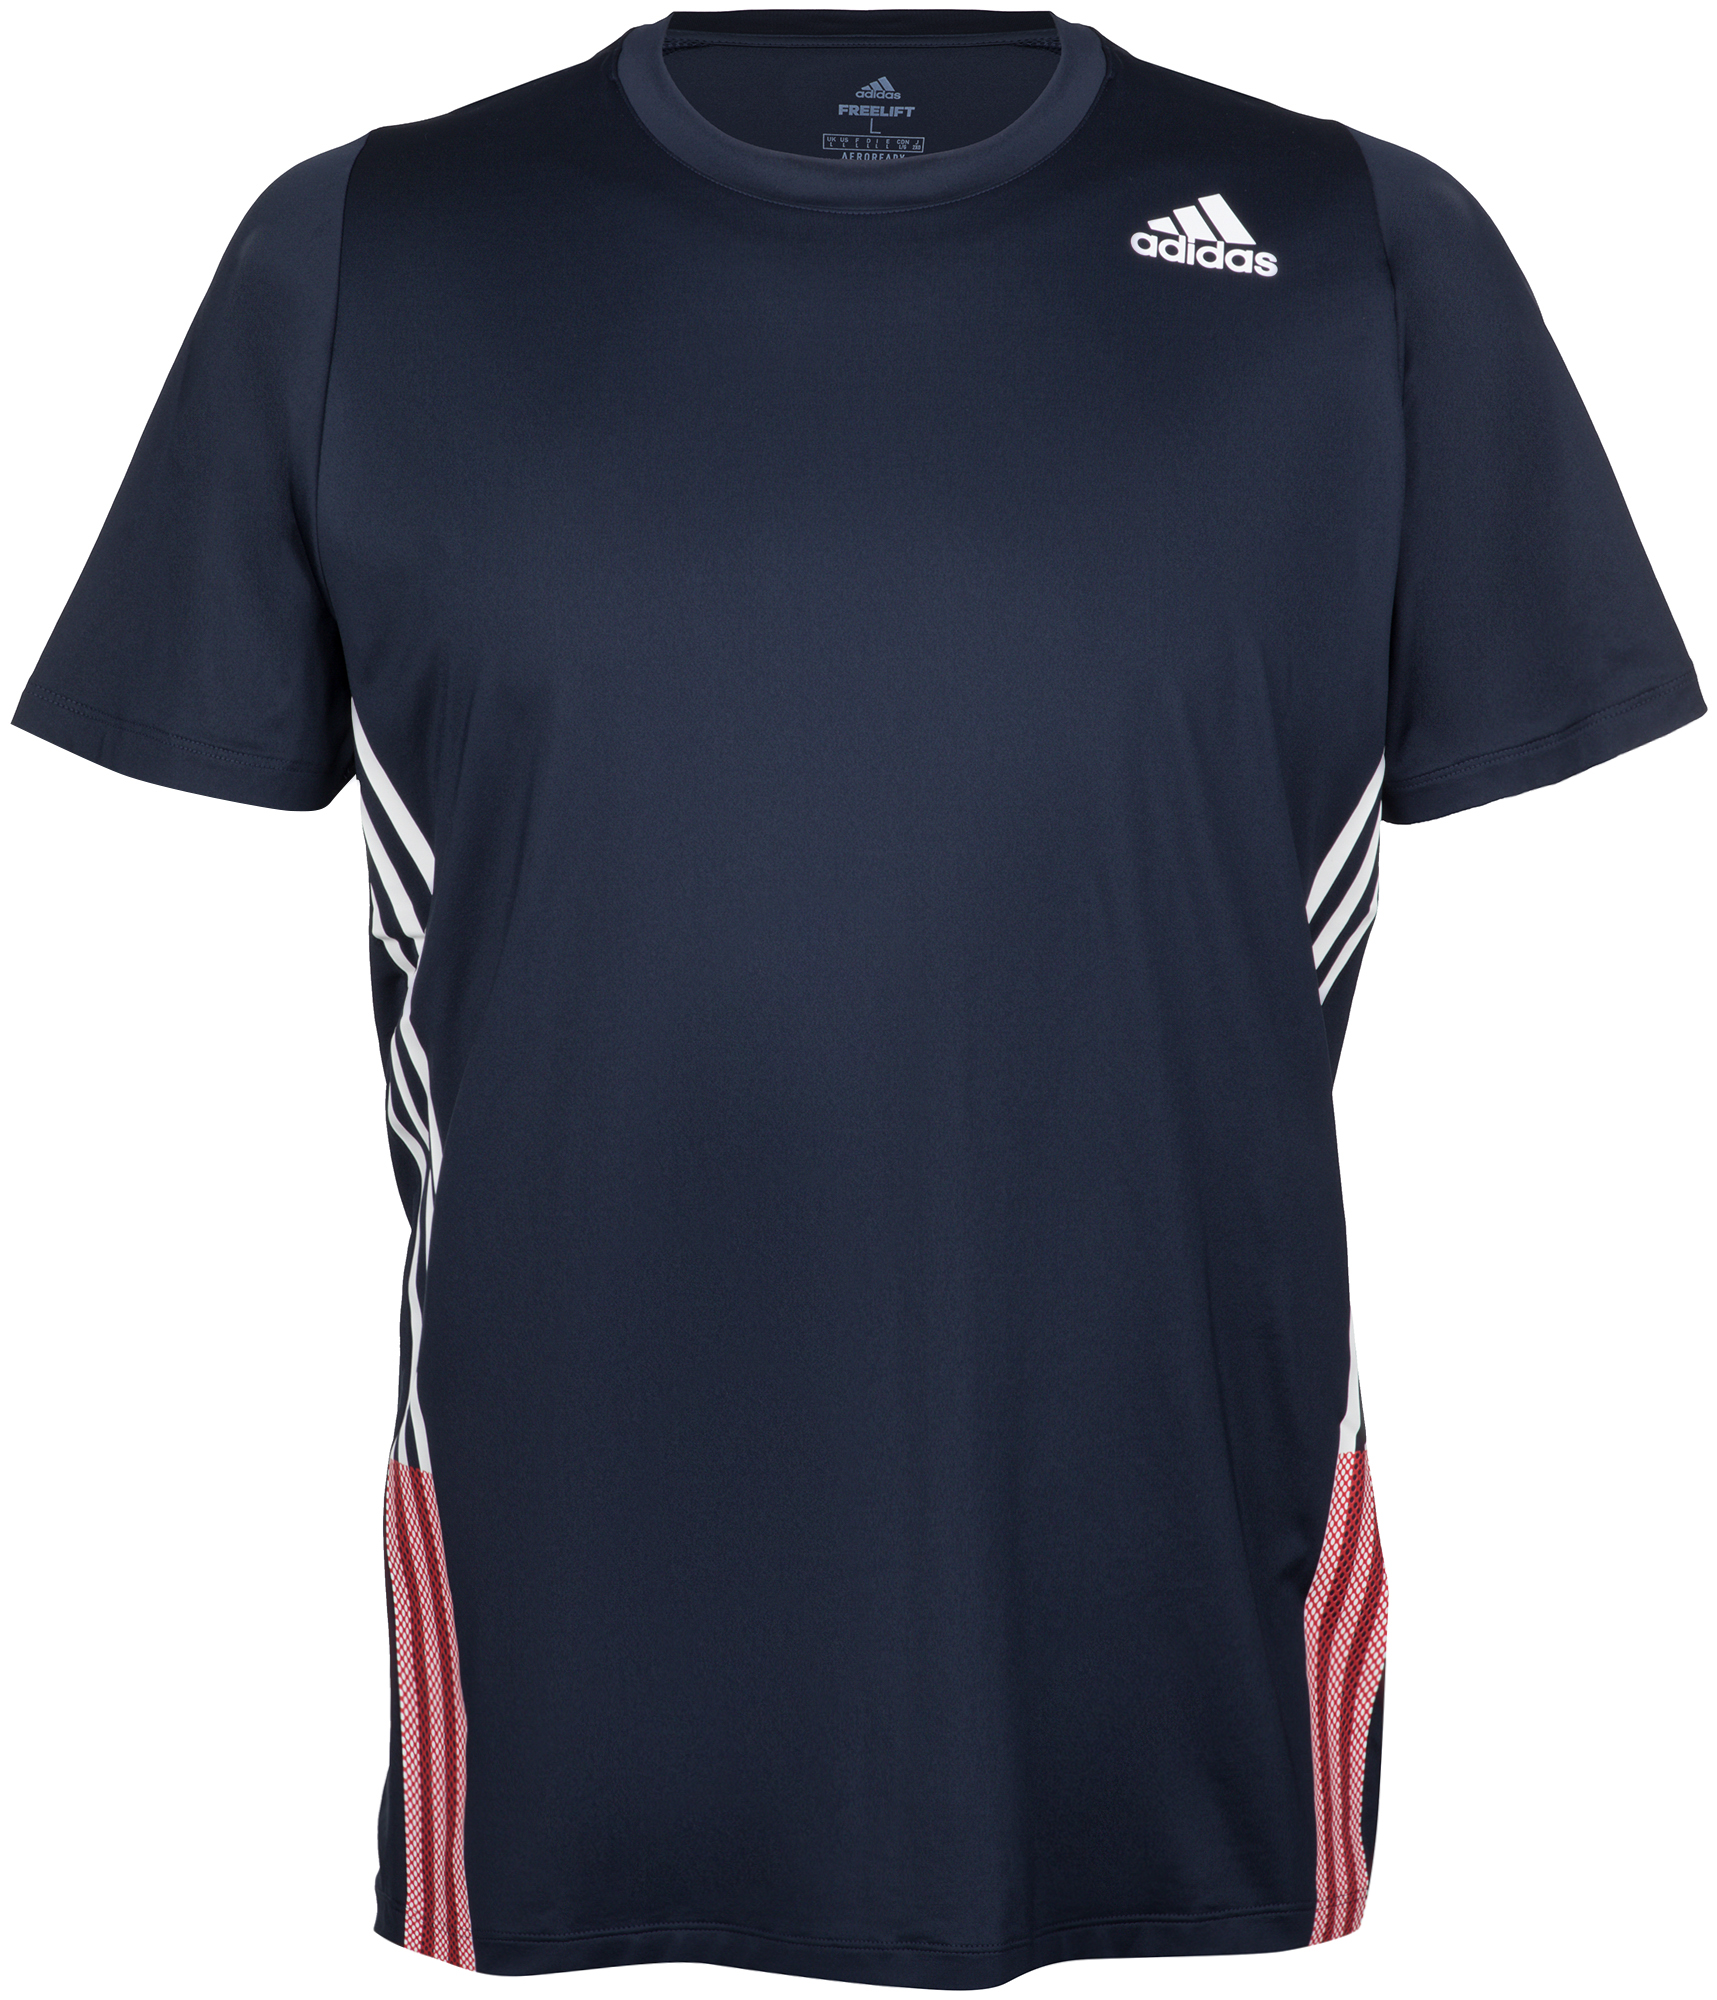 Adidas Футболка мужская Adidas FreeLift 3-Stripes, размер 48-50 adidas футболка freelift grad linkha